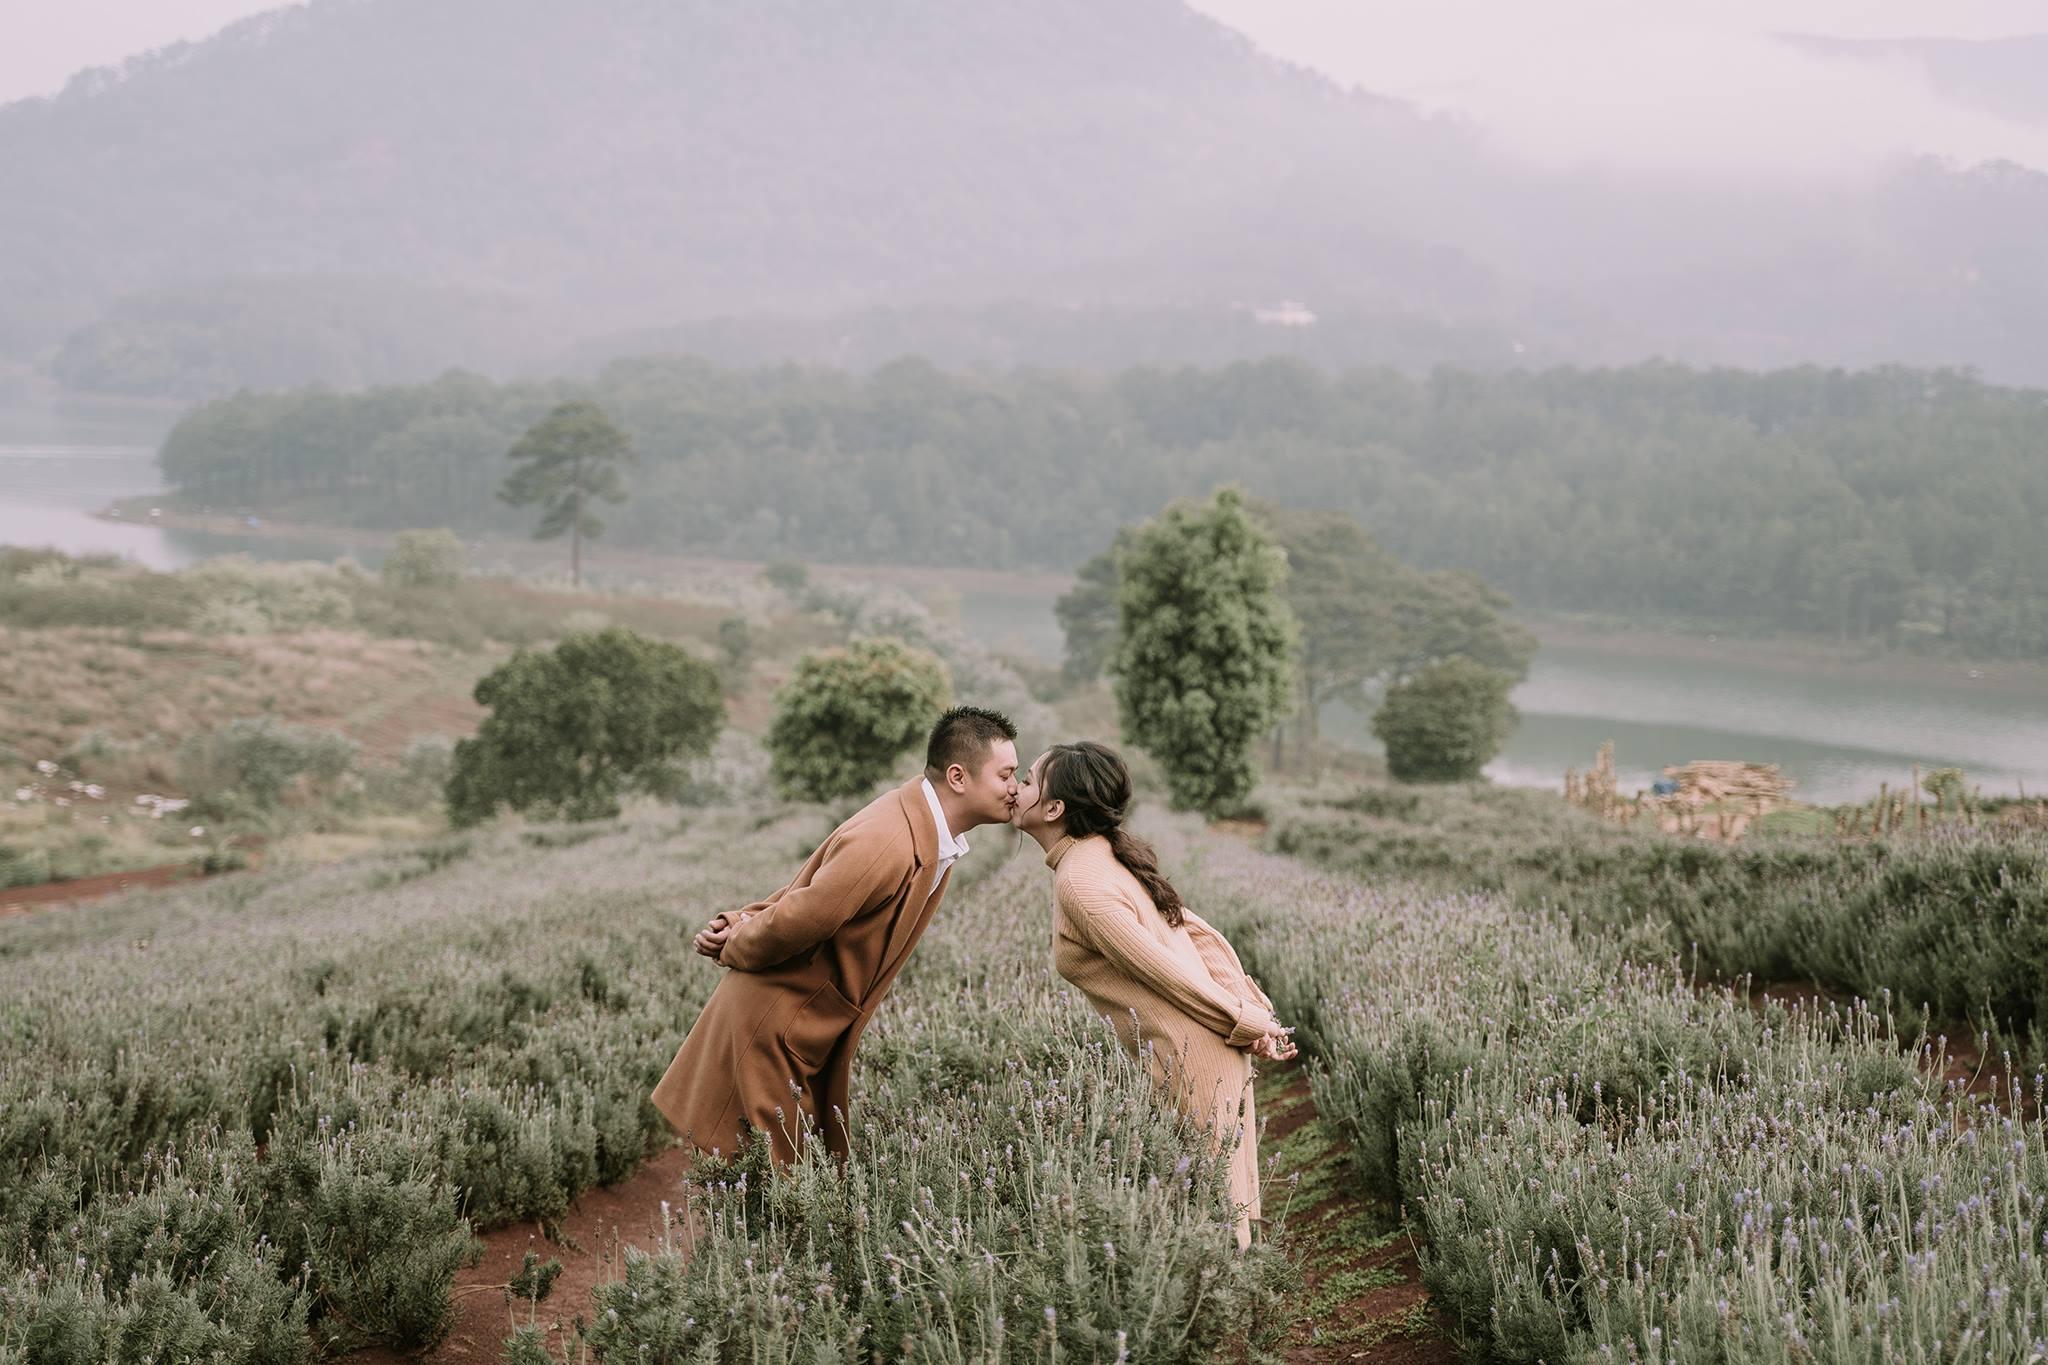 Top 10 Studio Chup Anh Cuoi Dep Nhat Tai Tphcm Iu Photograph 4